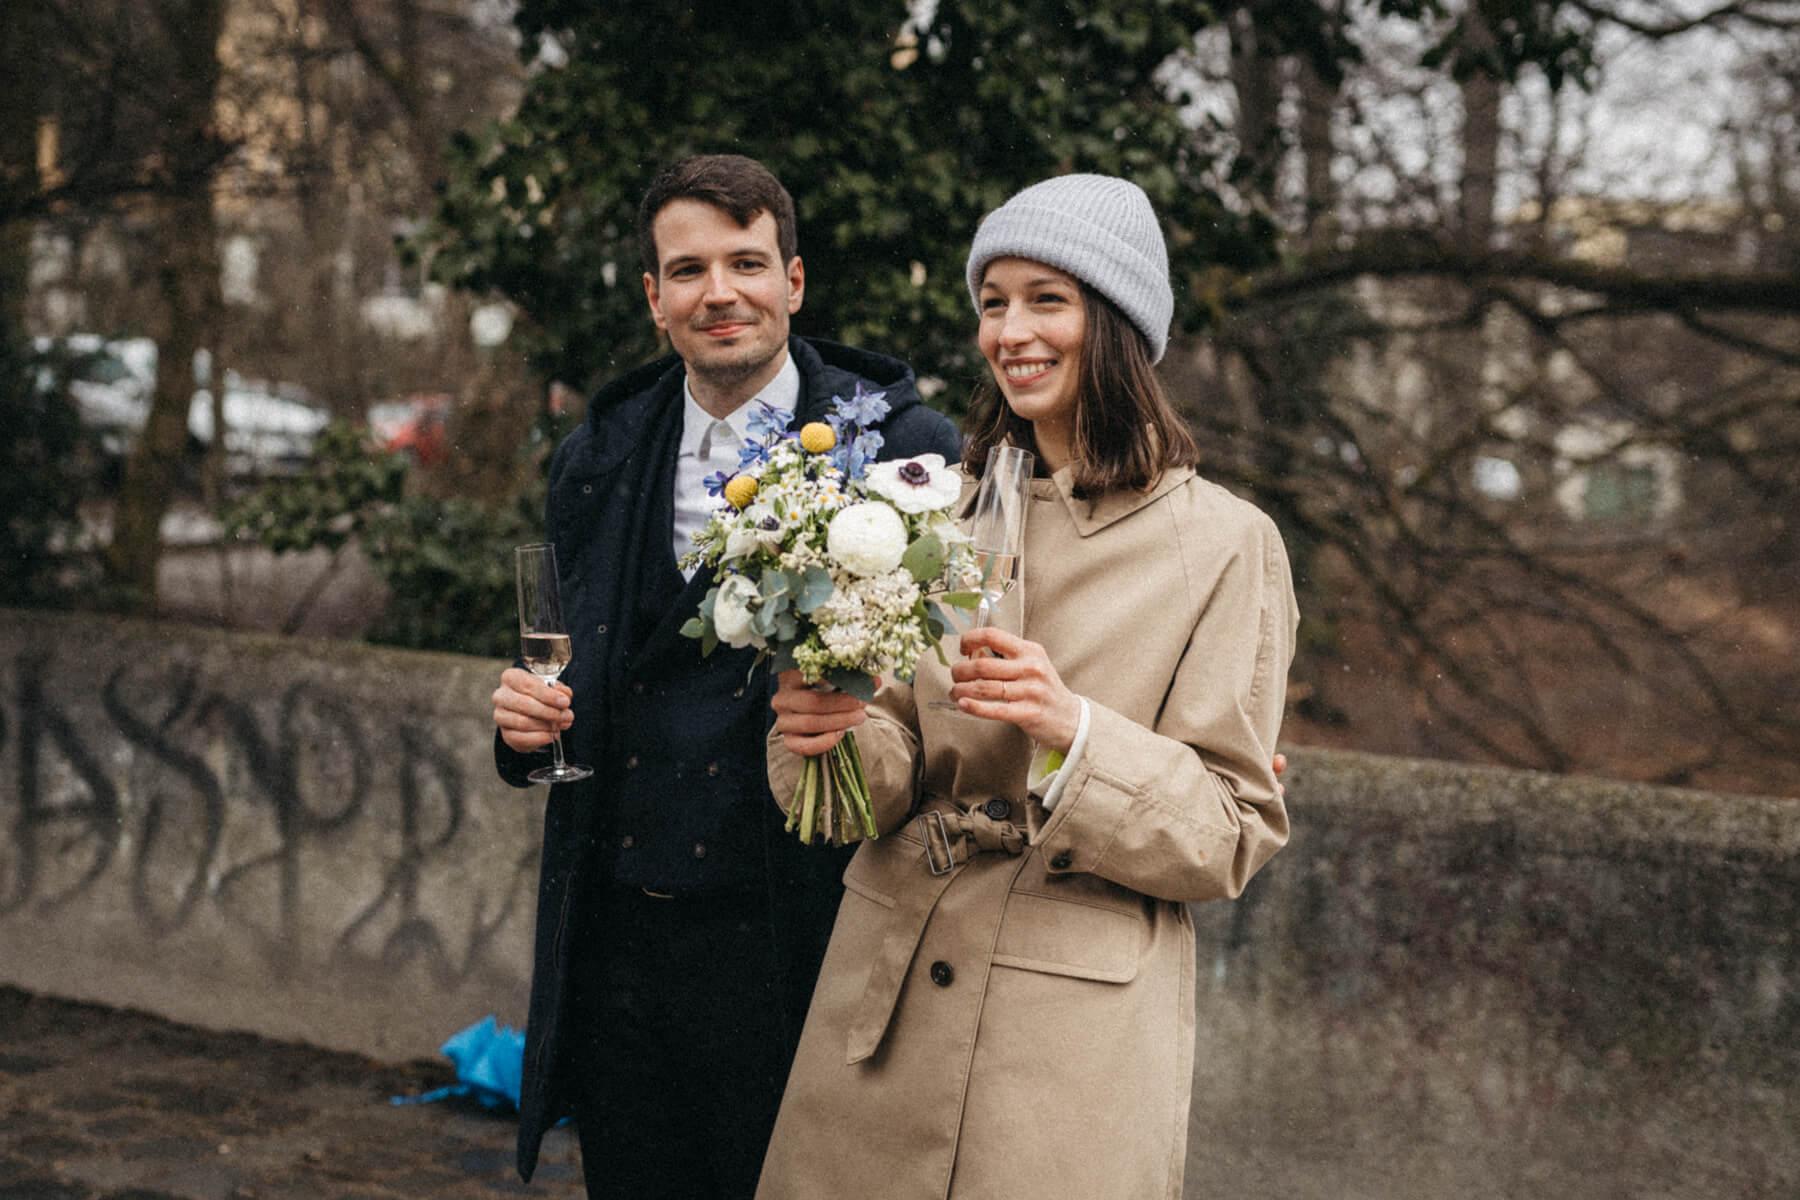 raissa simon fotografie urban civil wedding munich 039 - Nikolija + Niko